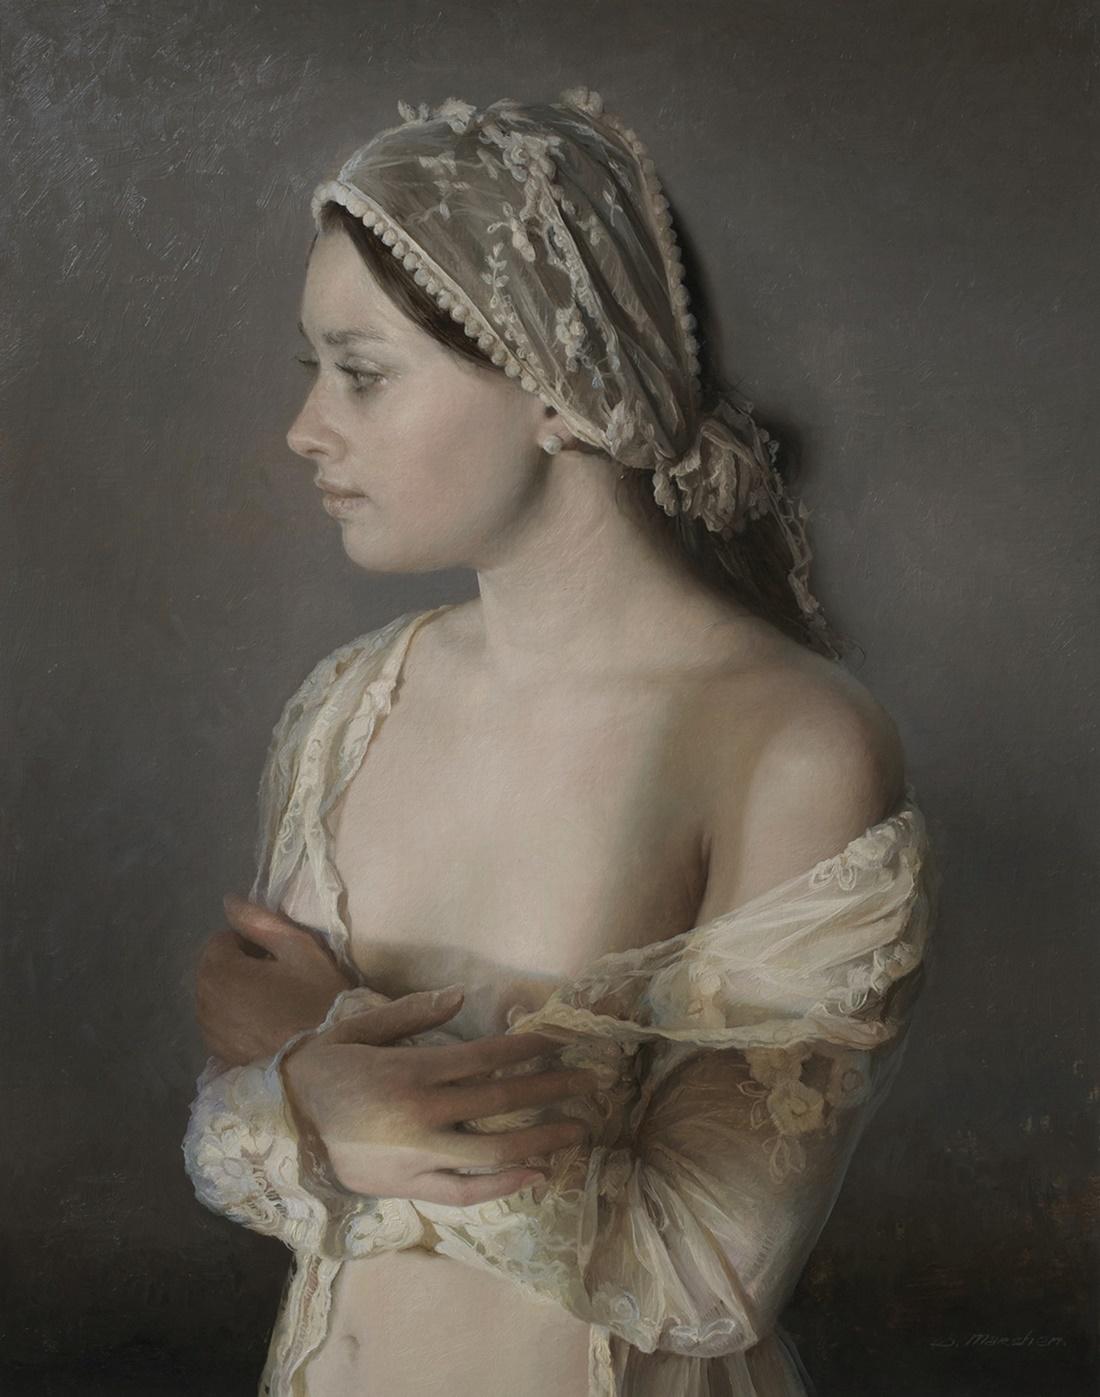 Women's images by a Russian realist artist Sergey Marshennikov - 29